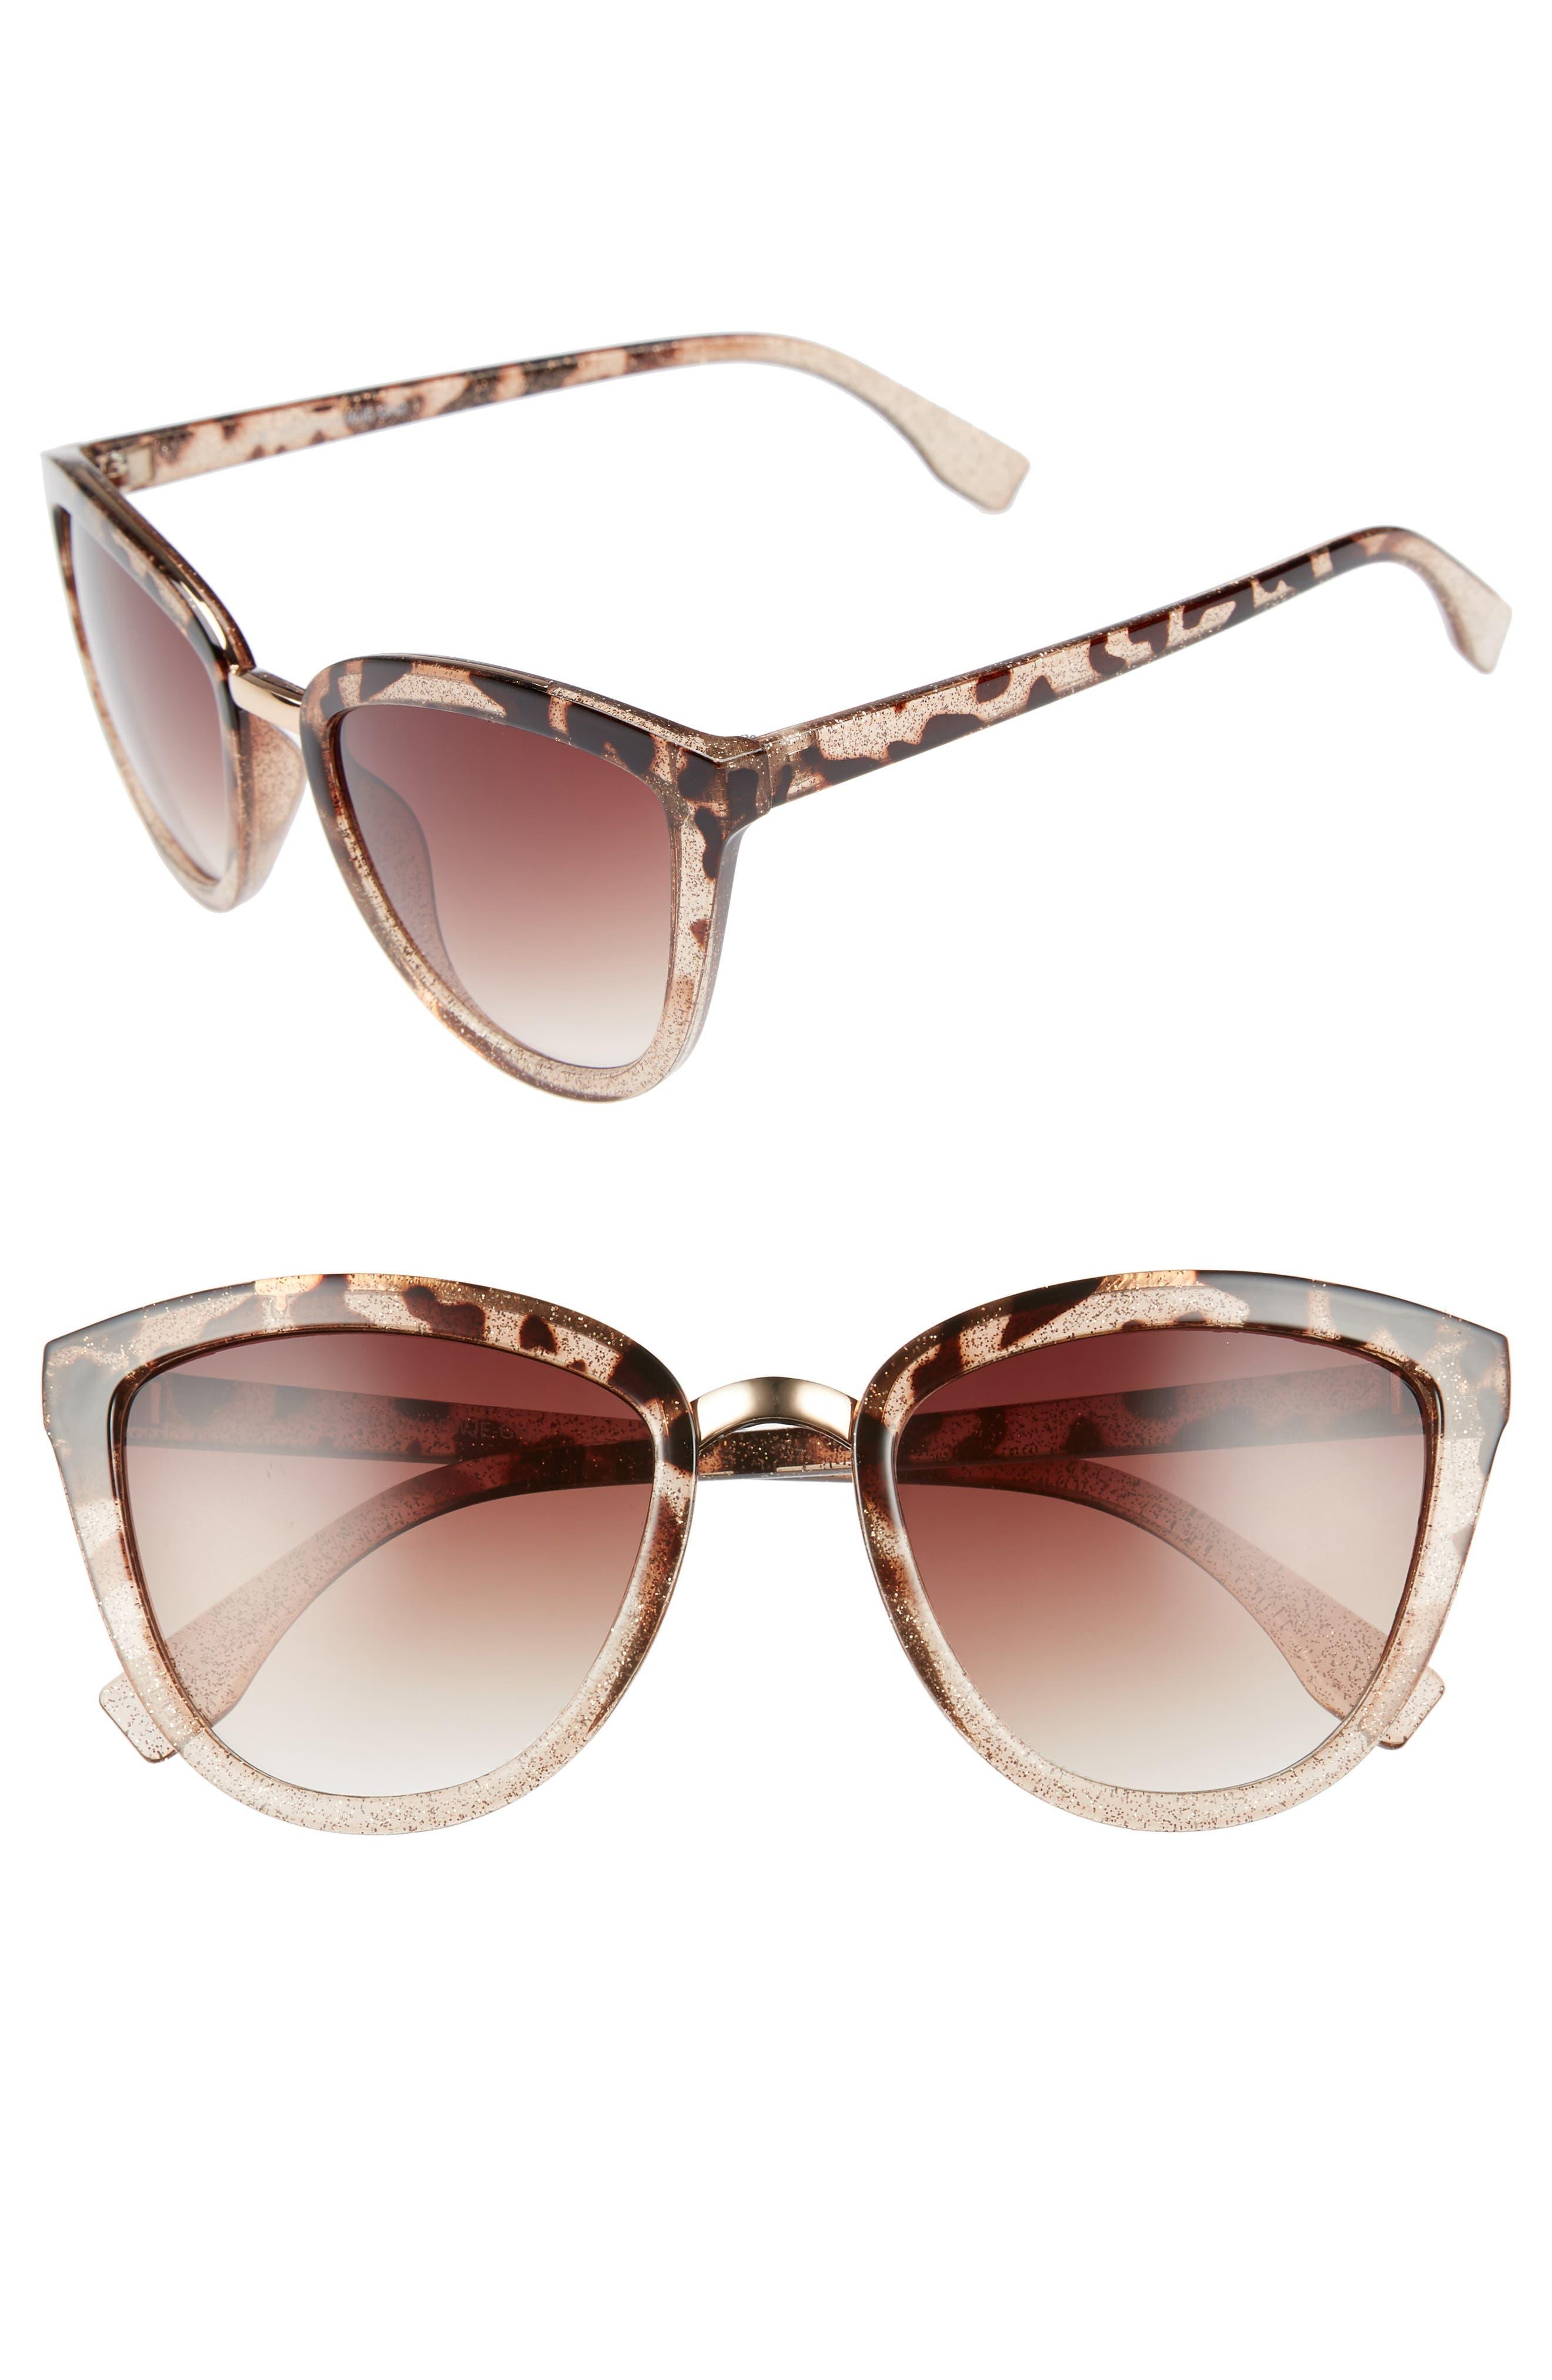 54mm Sparkle Cat Eye Sunglasses,                         Main,                         color, 200